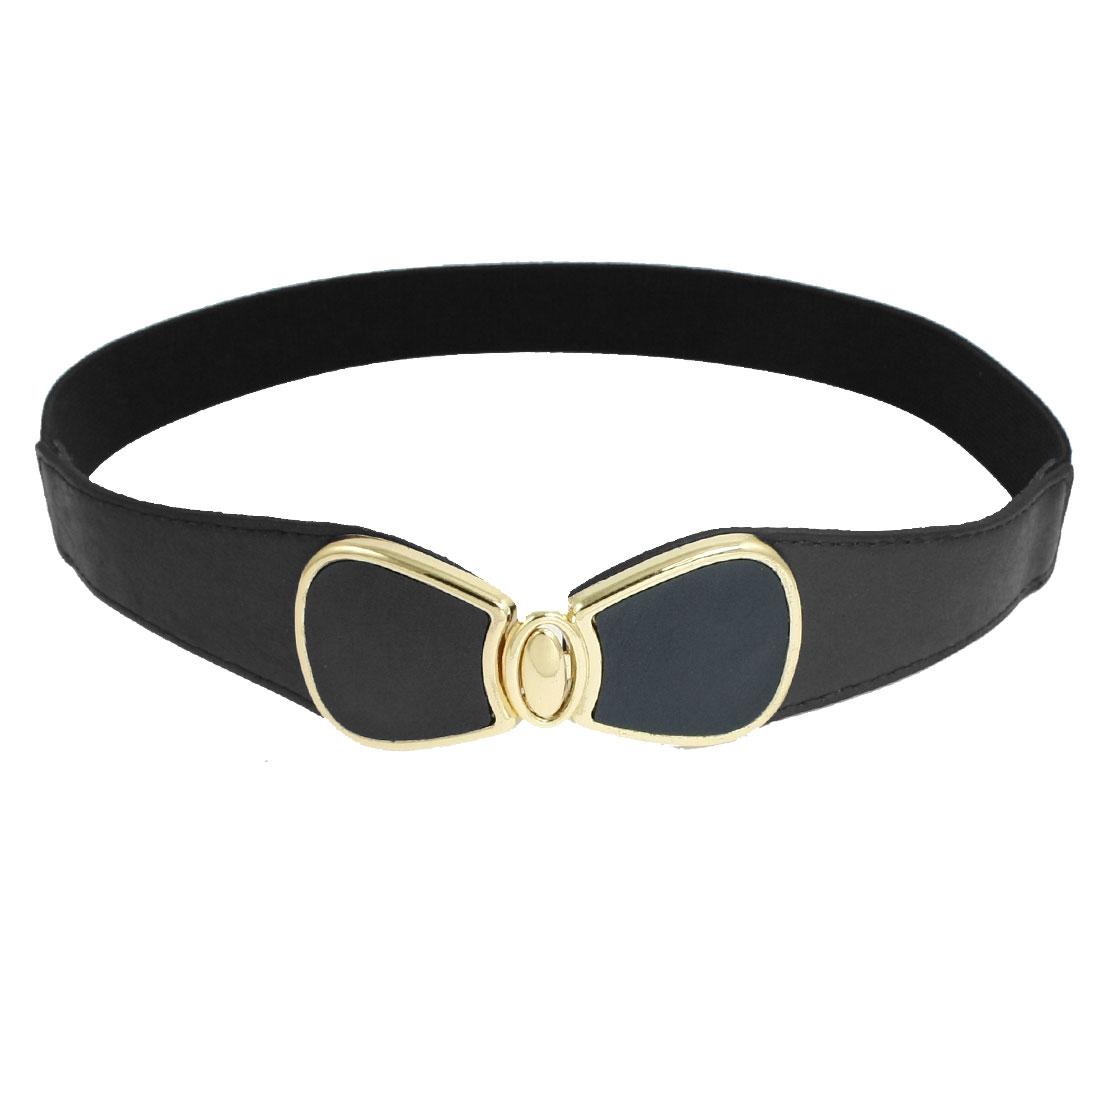 Lady Faux Leather Bowknot Interlock Buckle Strecth Cinch Belt Dark Blue